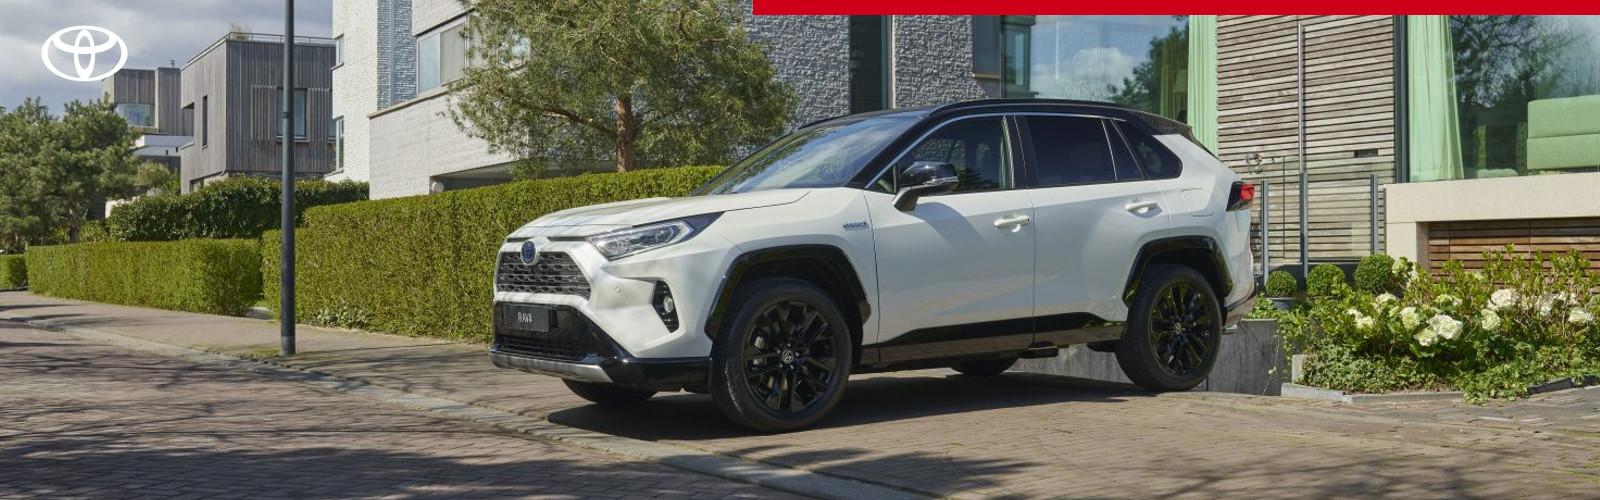 Mengelers Automotive Hybride Upgrade